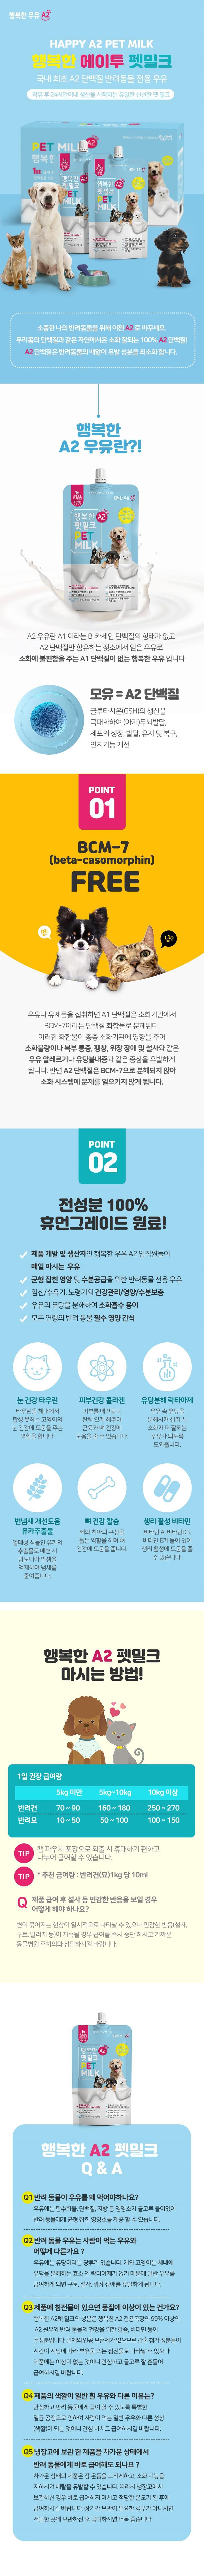 [EVENT] 행복한 A2펫밀크 2개-상품이미지-0